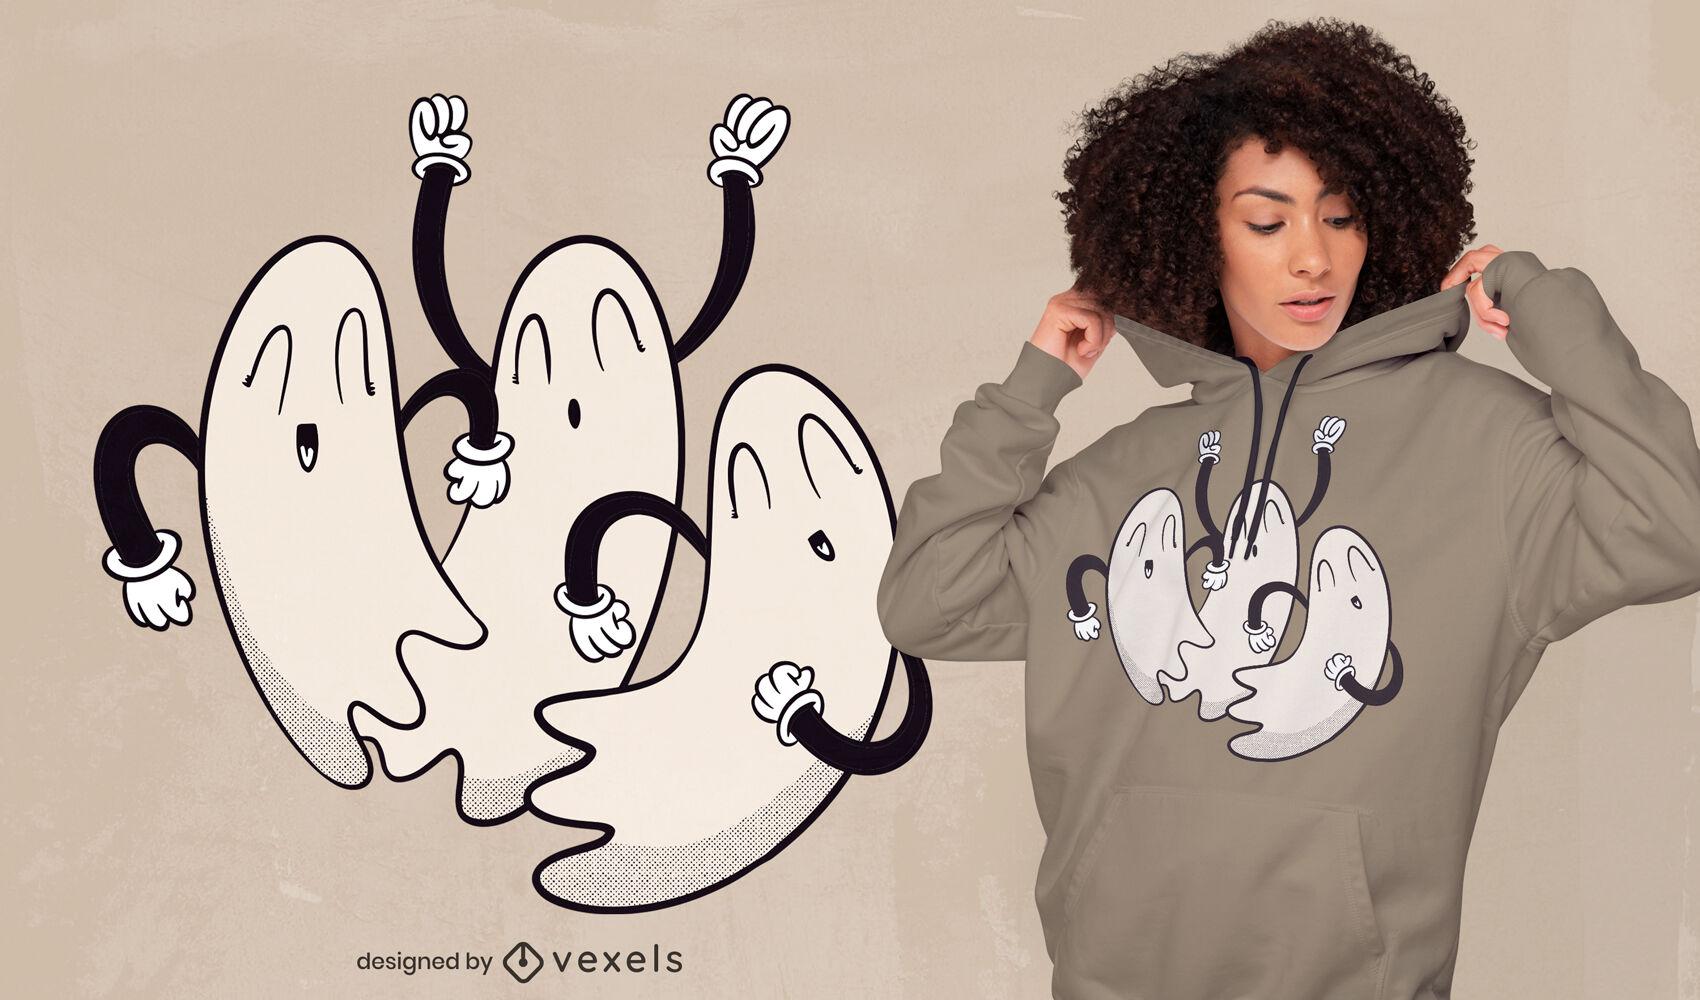 REQUEST Cool ghosts t-shirt design retro cartoon